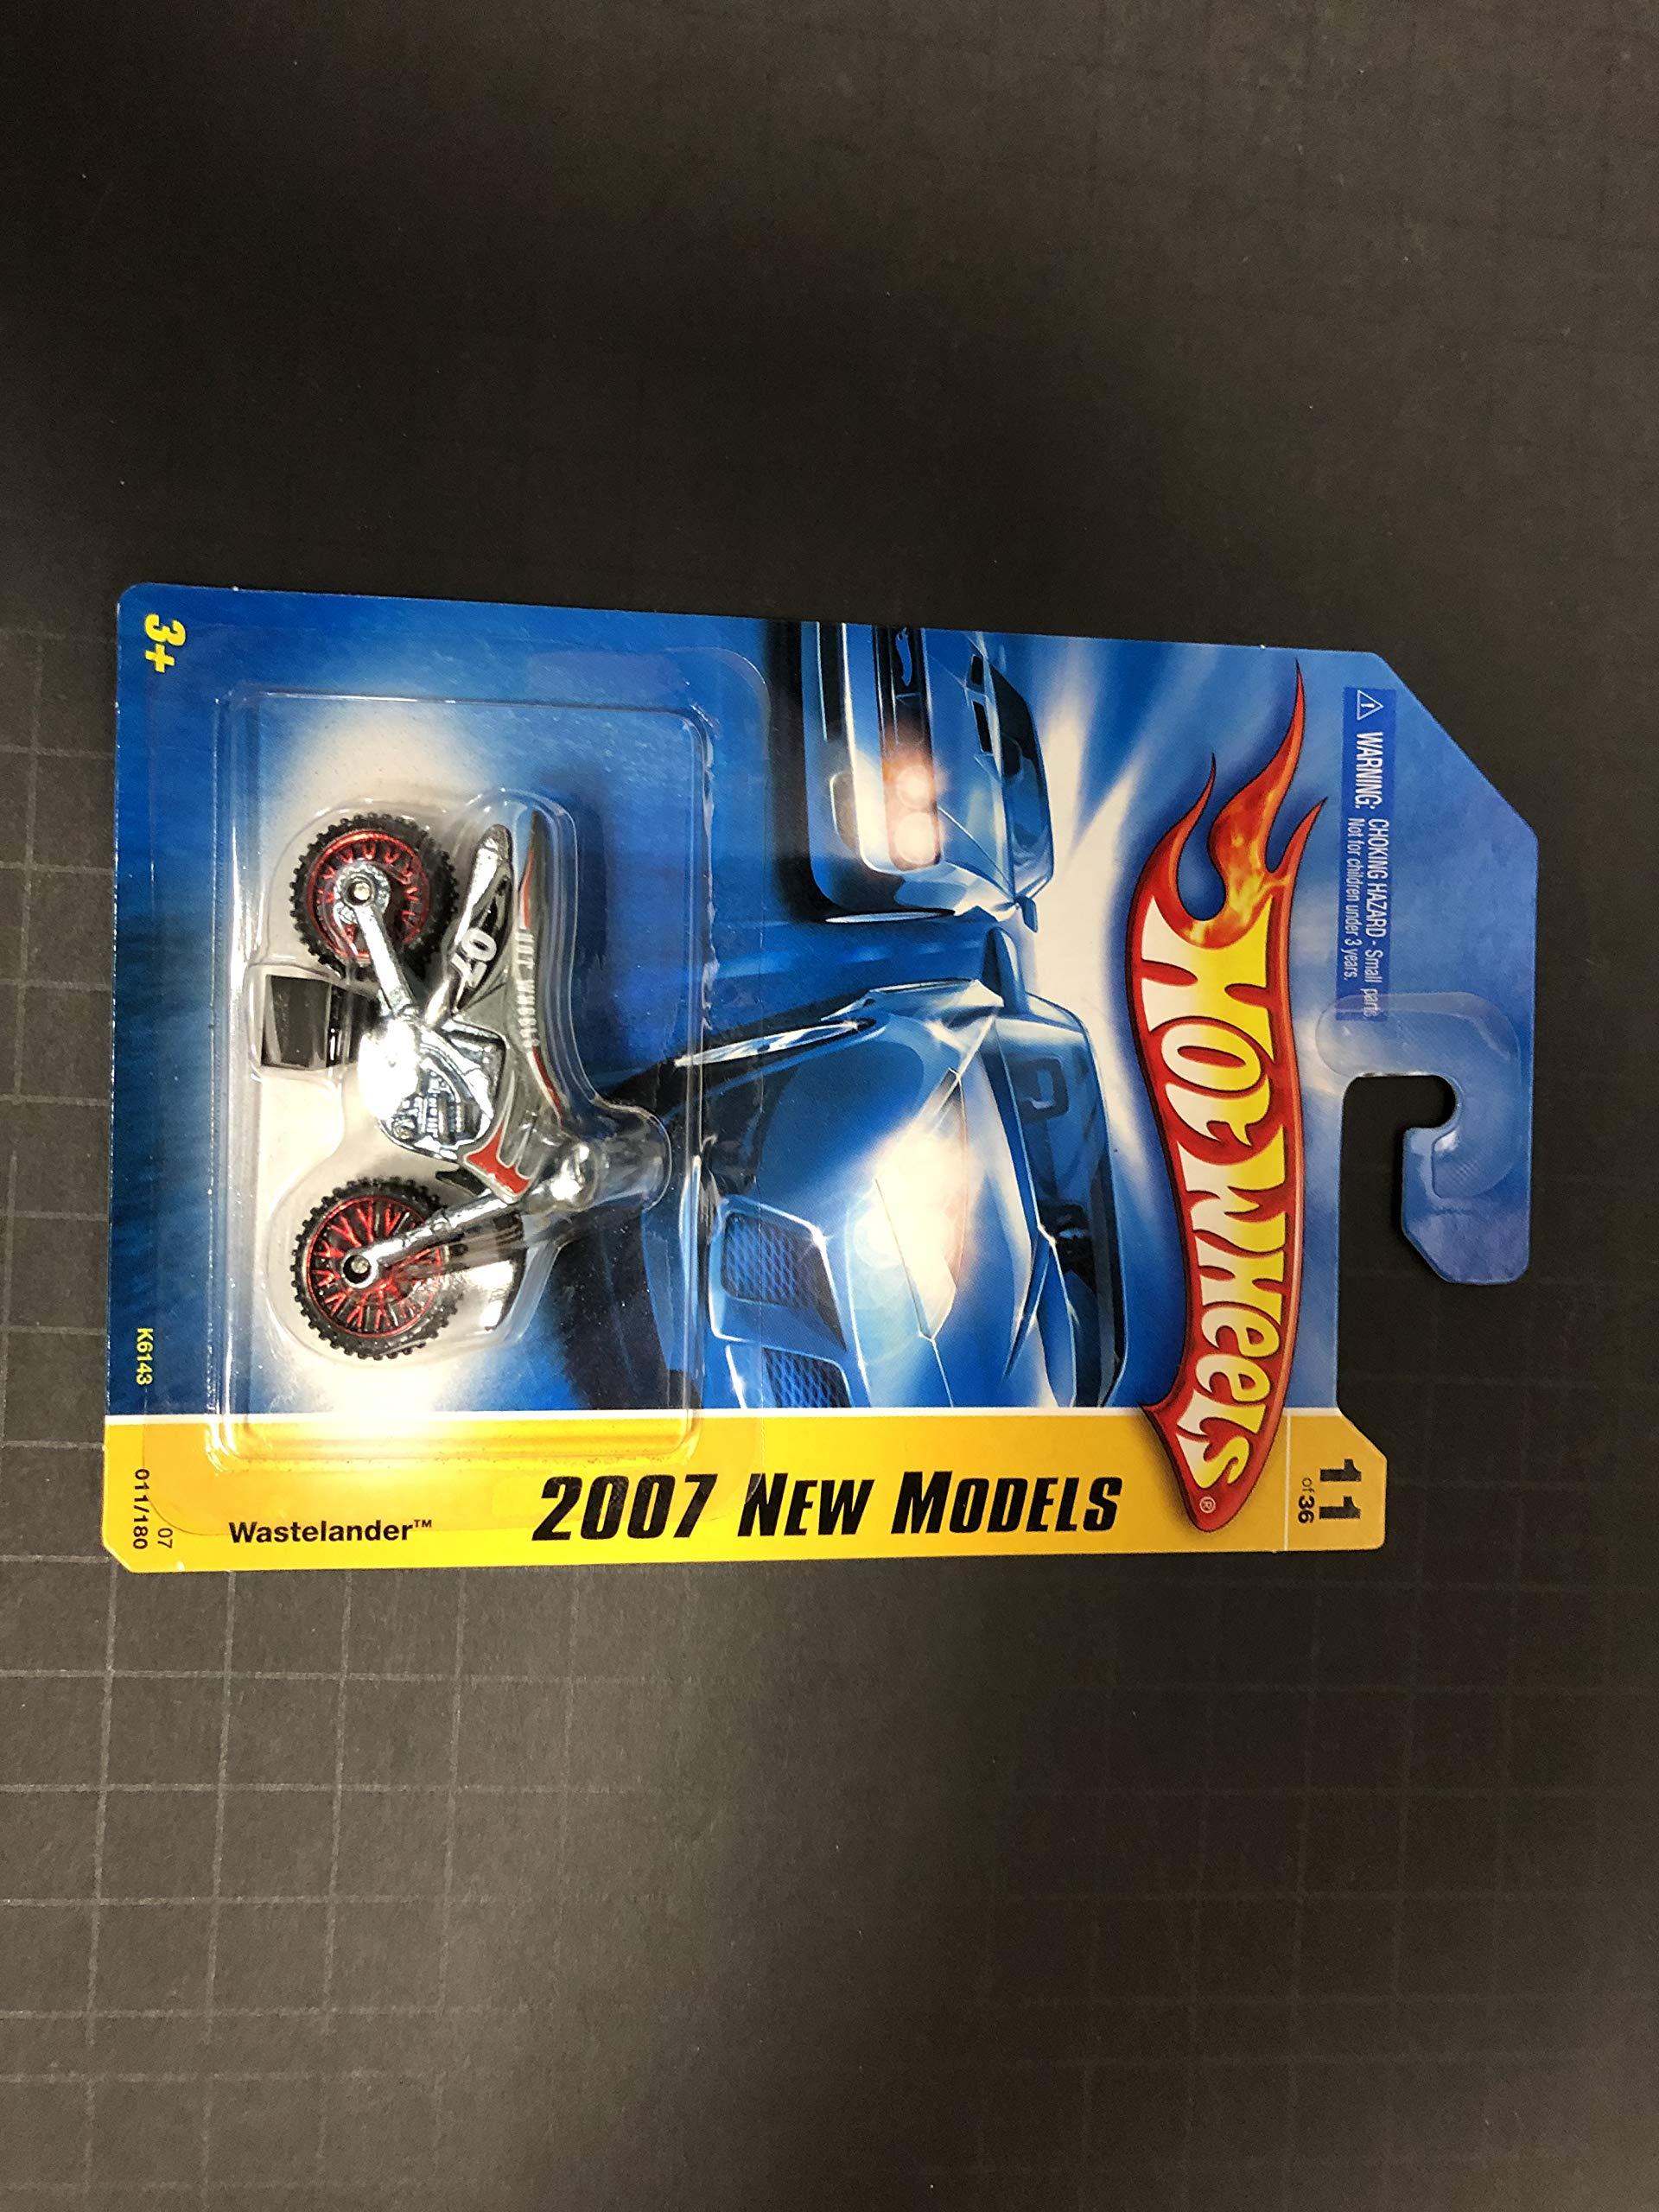 Wastelander Dirtbike Silver Color 2007 New Models 11 of 36 Hot Wheels diecast car No. 011